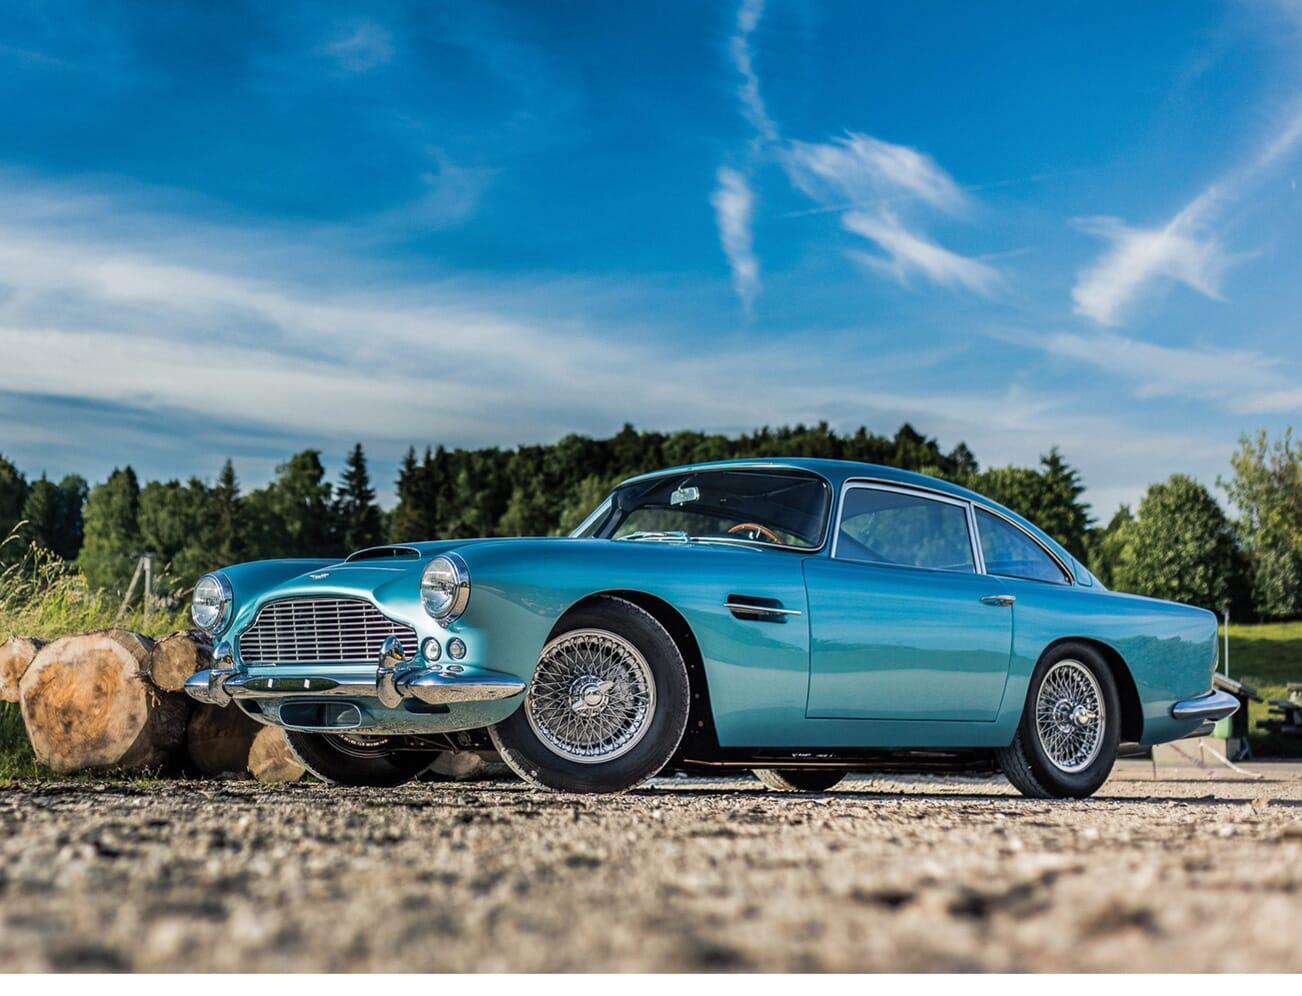 This 1962 Aston Martin Db4 Ss Engine Series Iv Still Shines Opumo Magazine